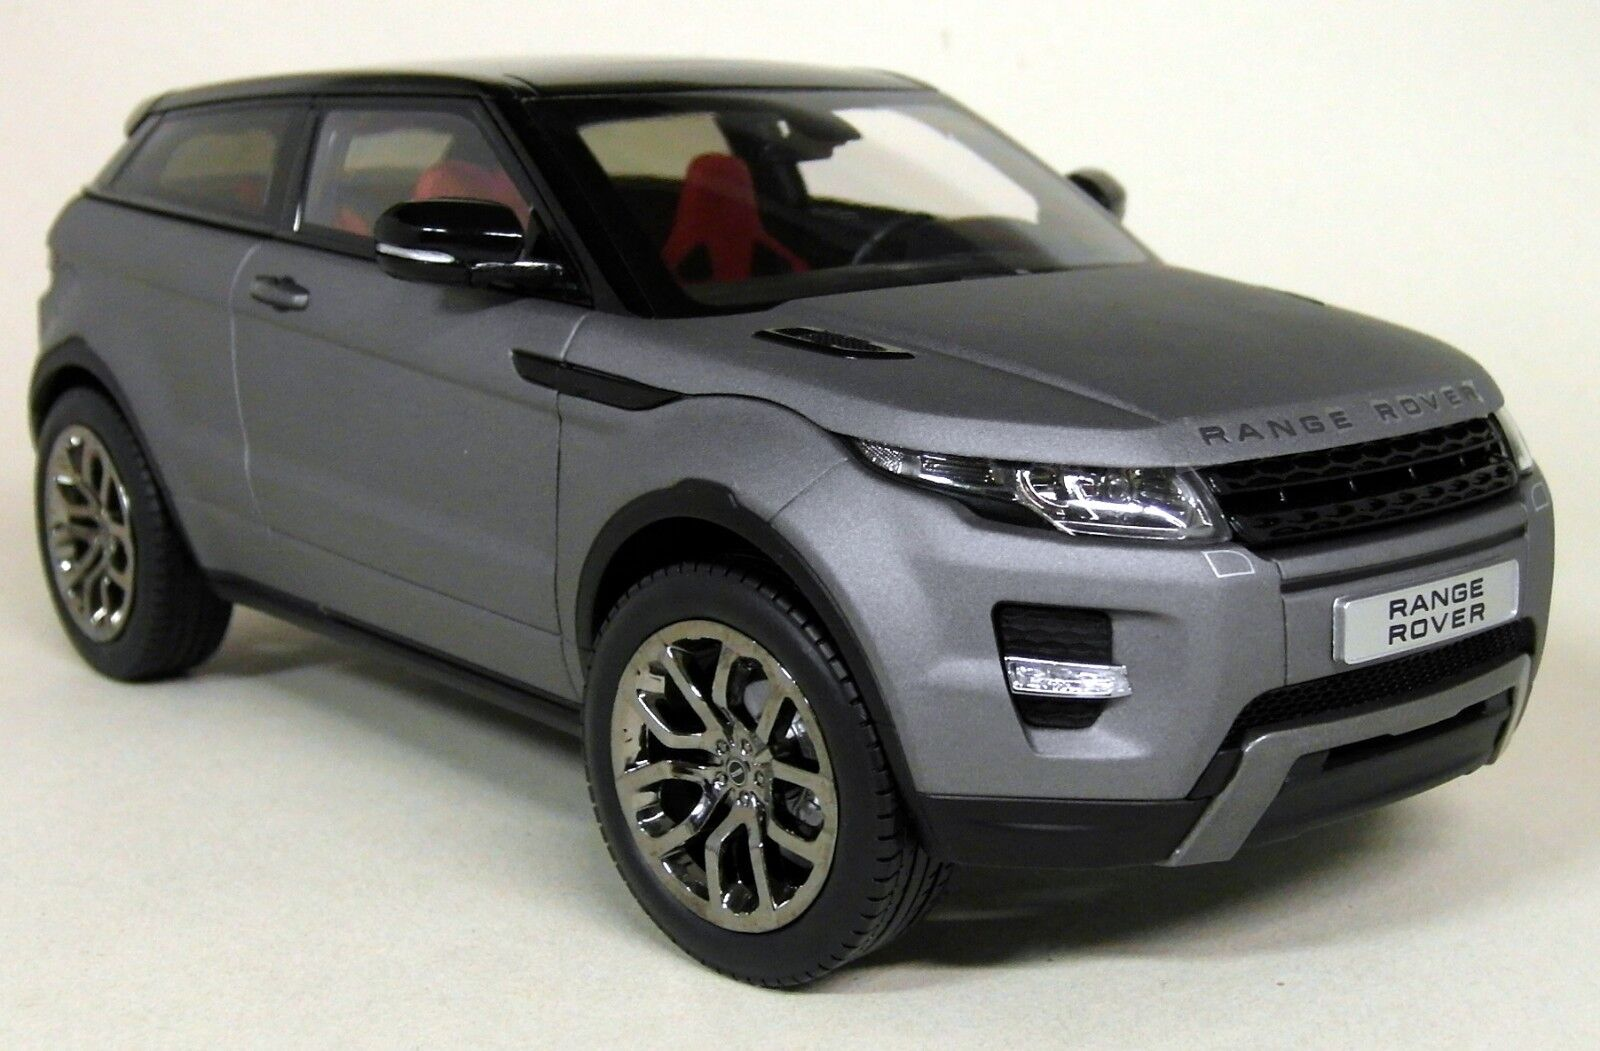 GT Autos 1 18 Scale - Range Rover Evoque Matt Grey Diecast model Car